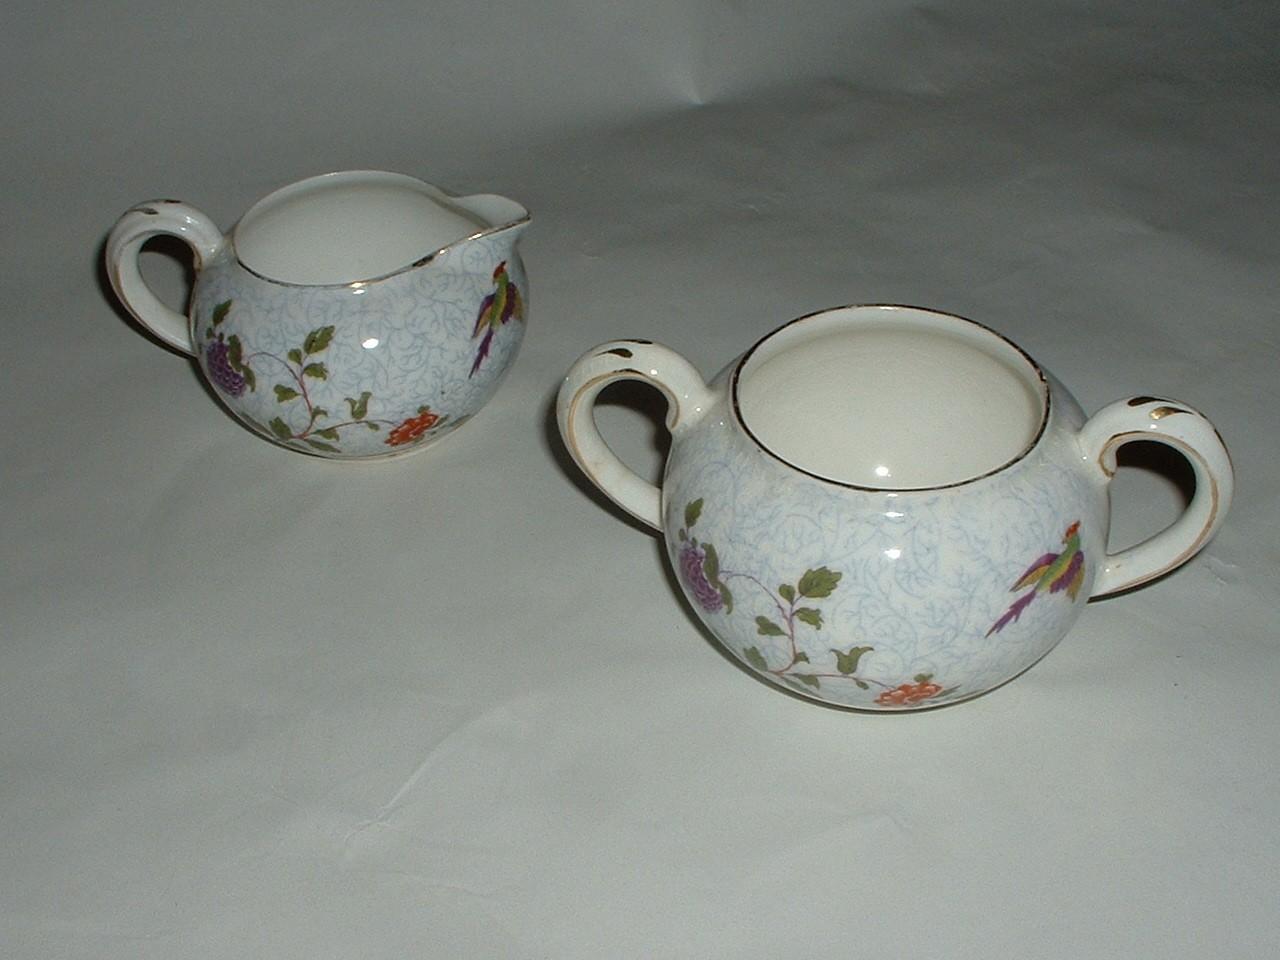 Vintage Crown Staffordshire Porcelain Open Sugar and Creamer